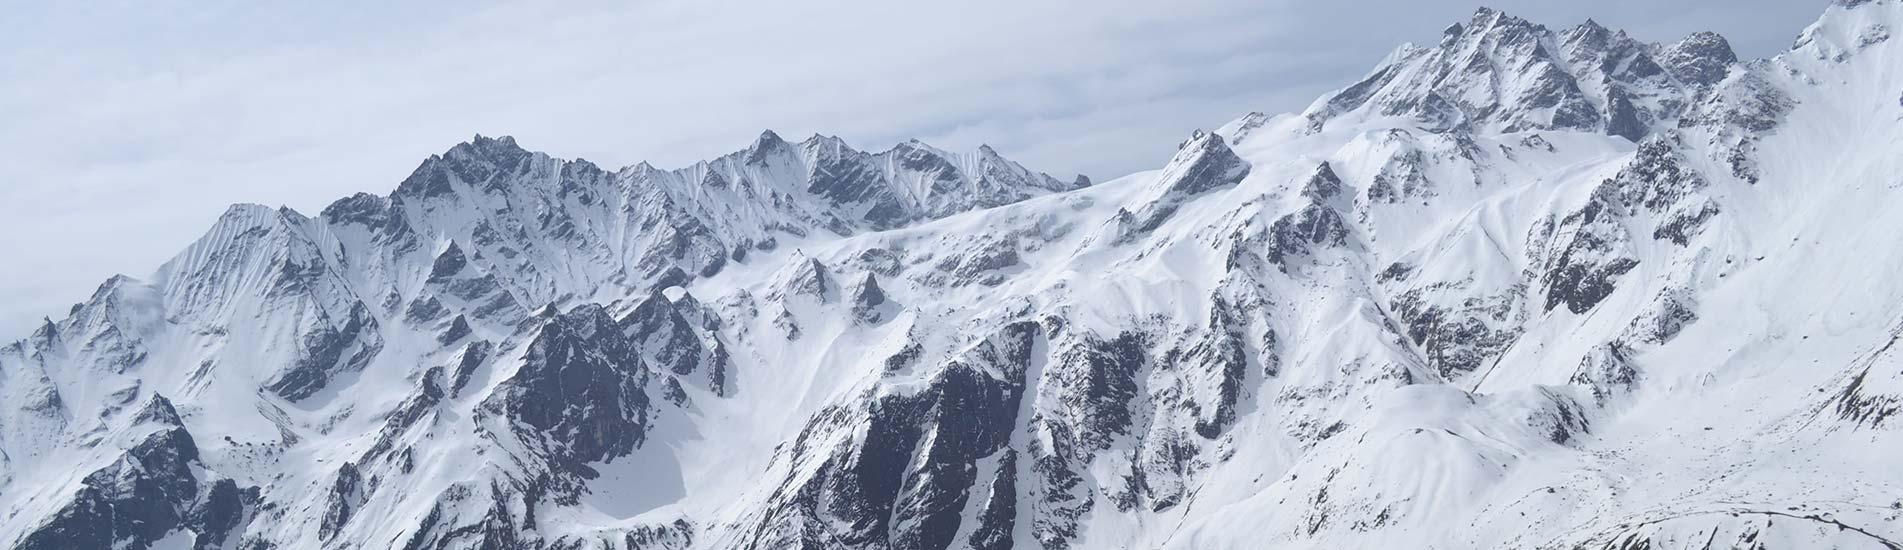 langtang valley trek banner (Weather In Nepal In November)